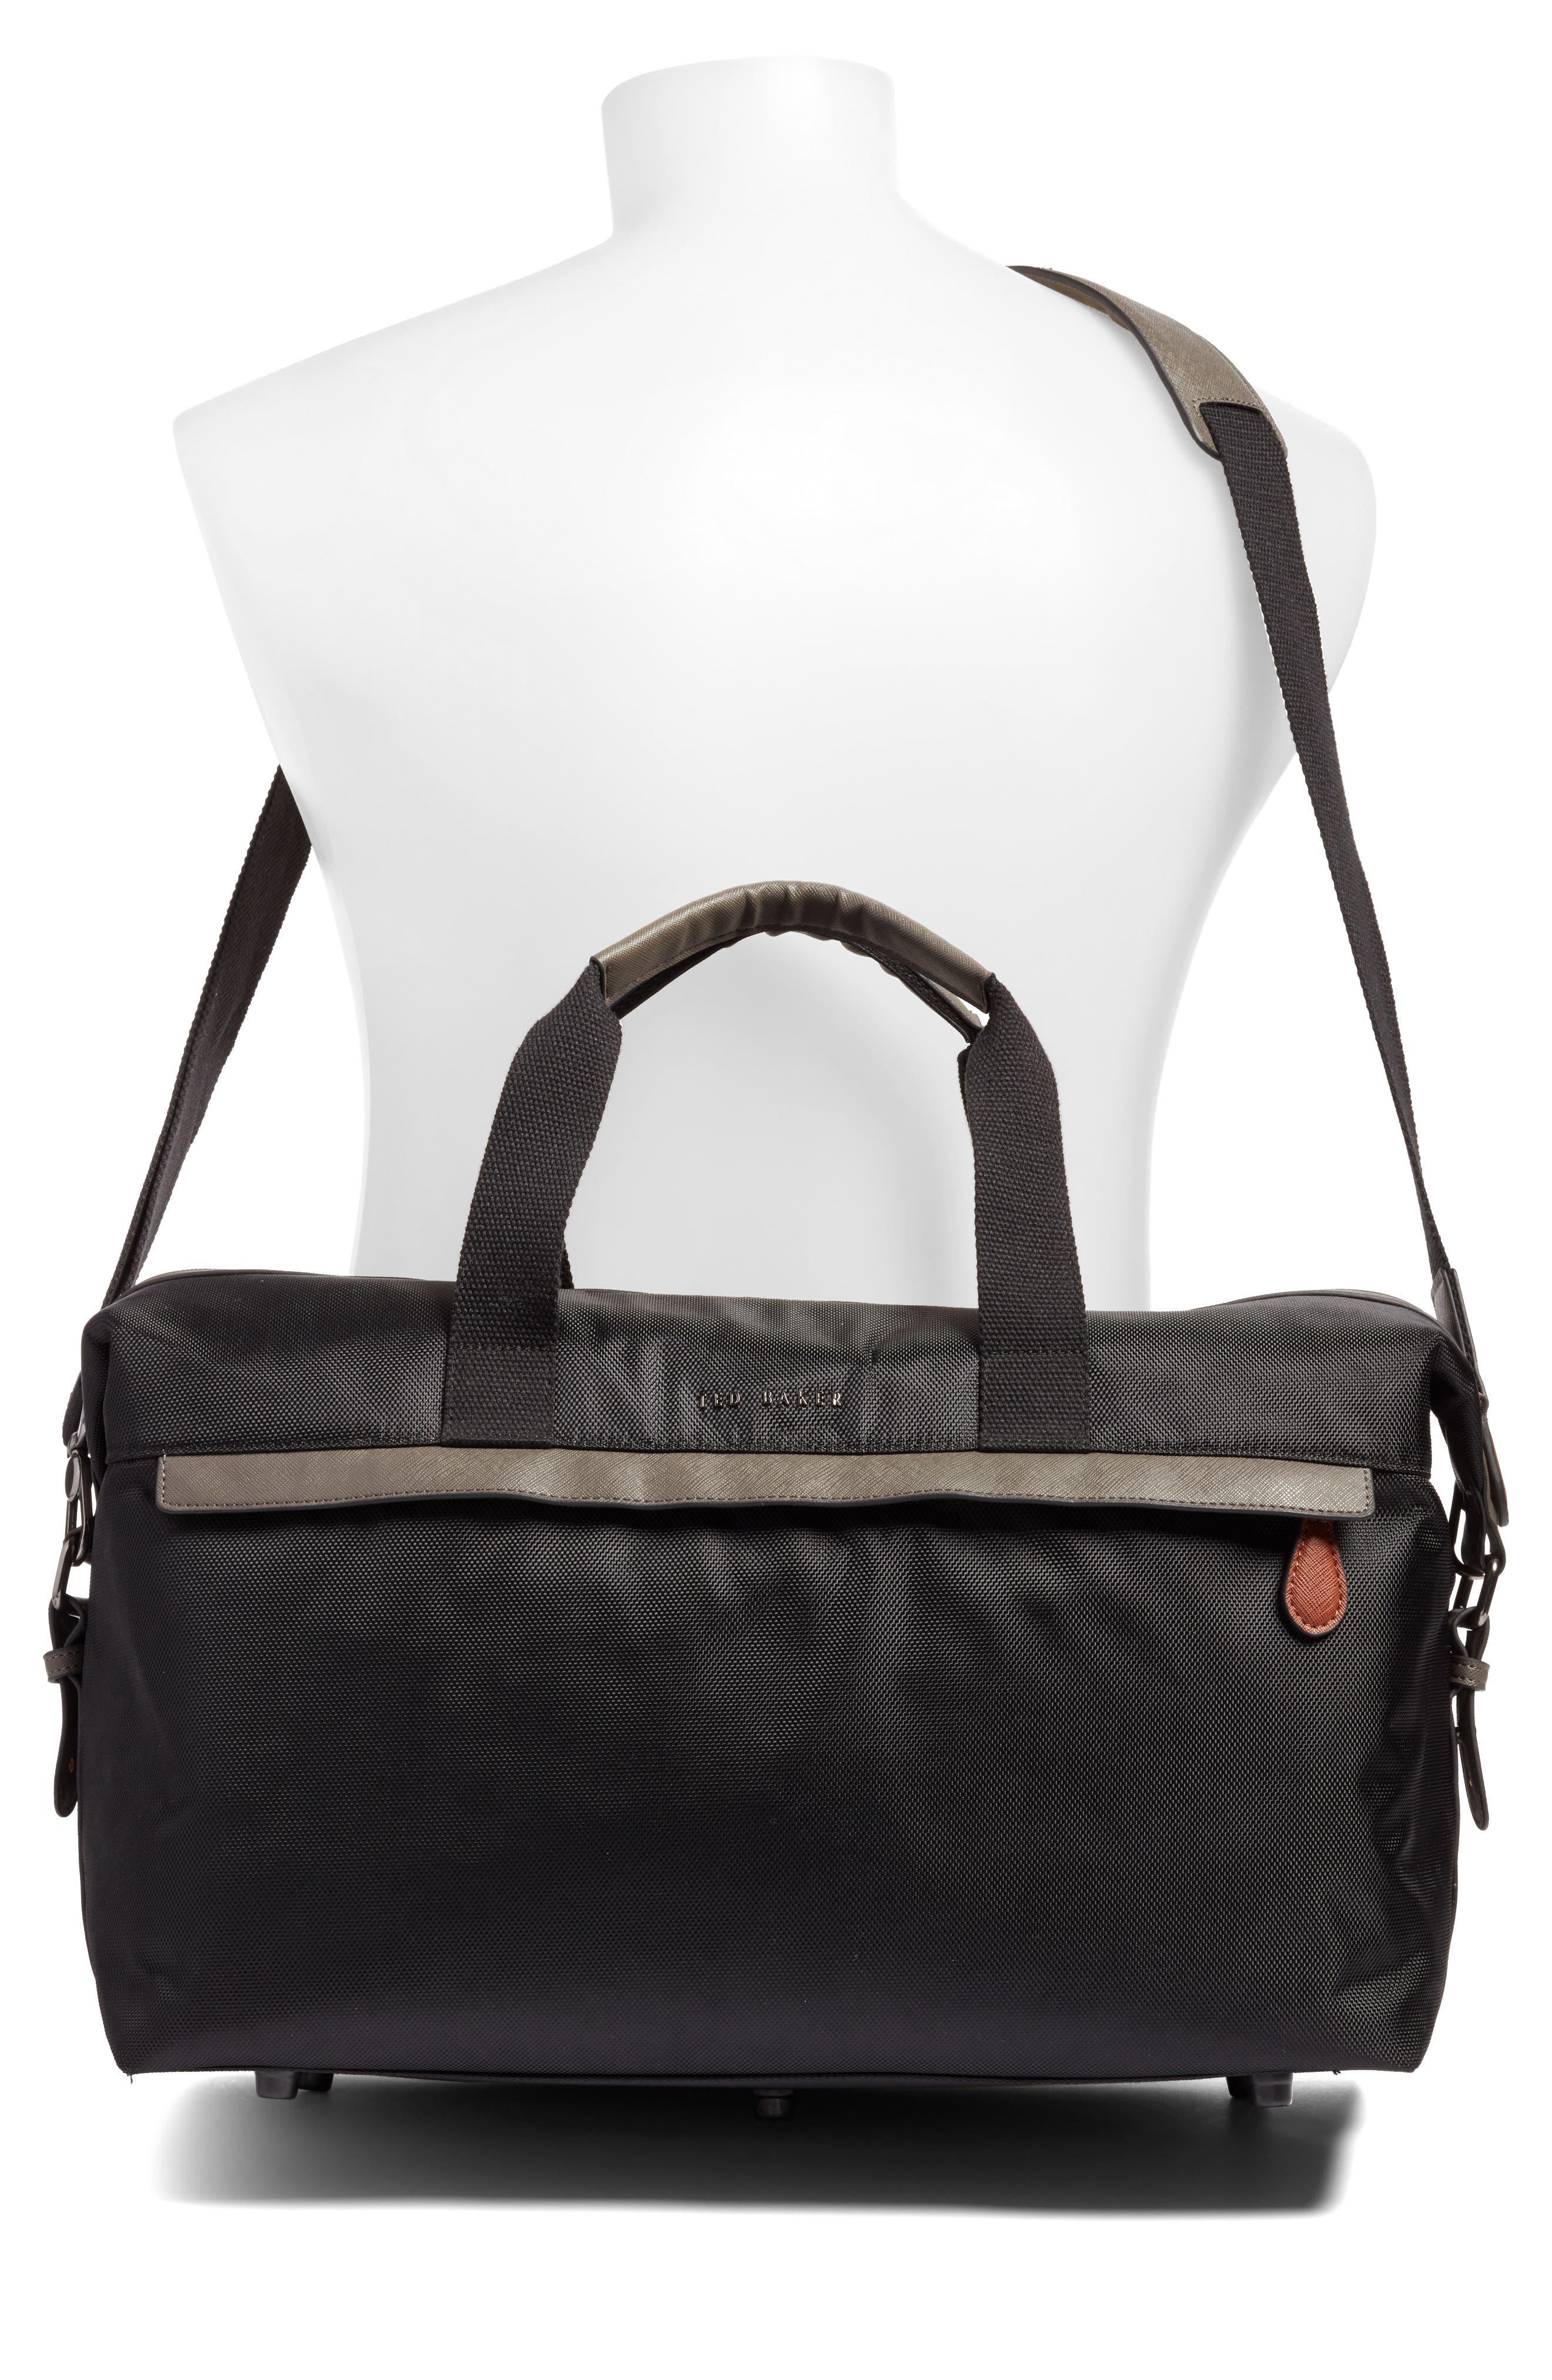 Zeebee Duffel Bag,                             Alternate thumbnail 2, color,                             001